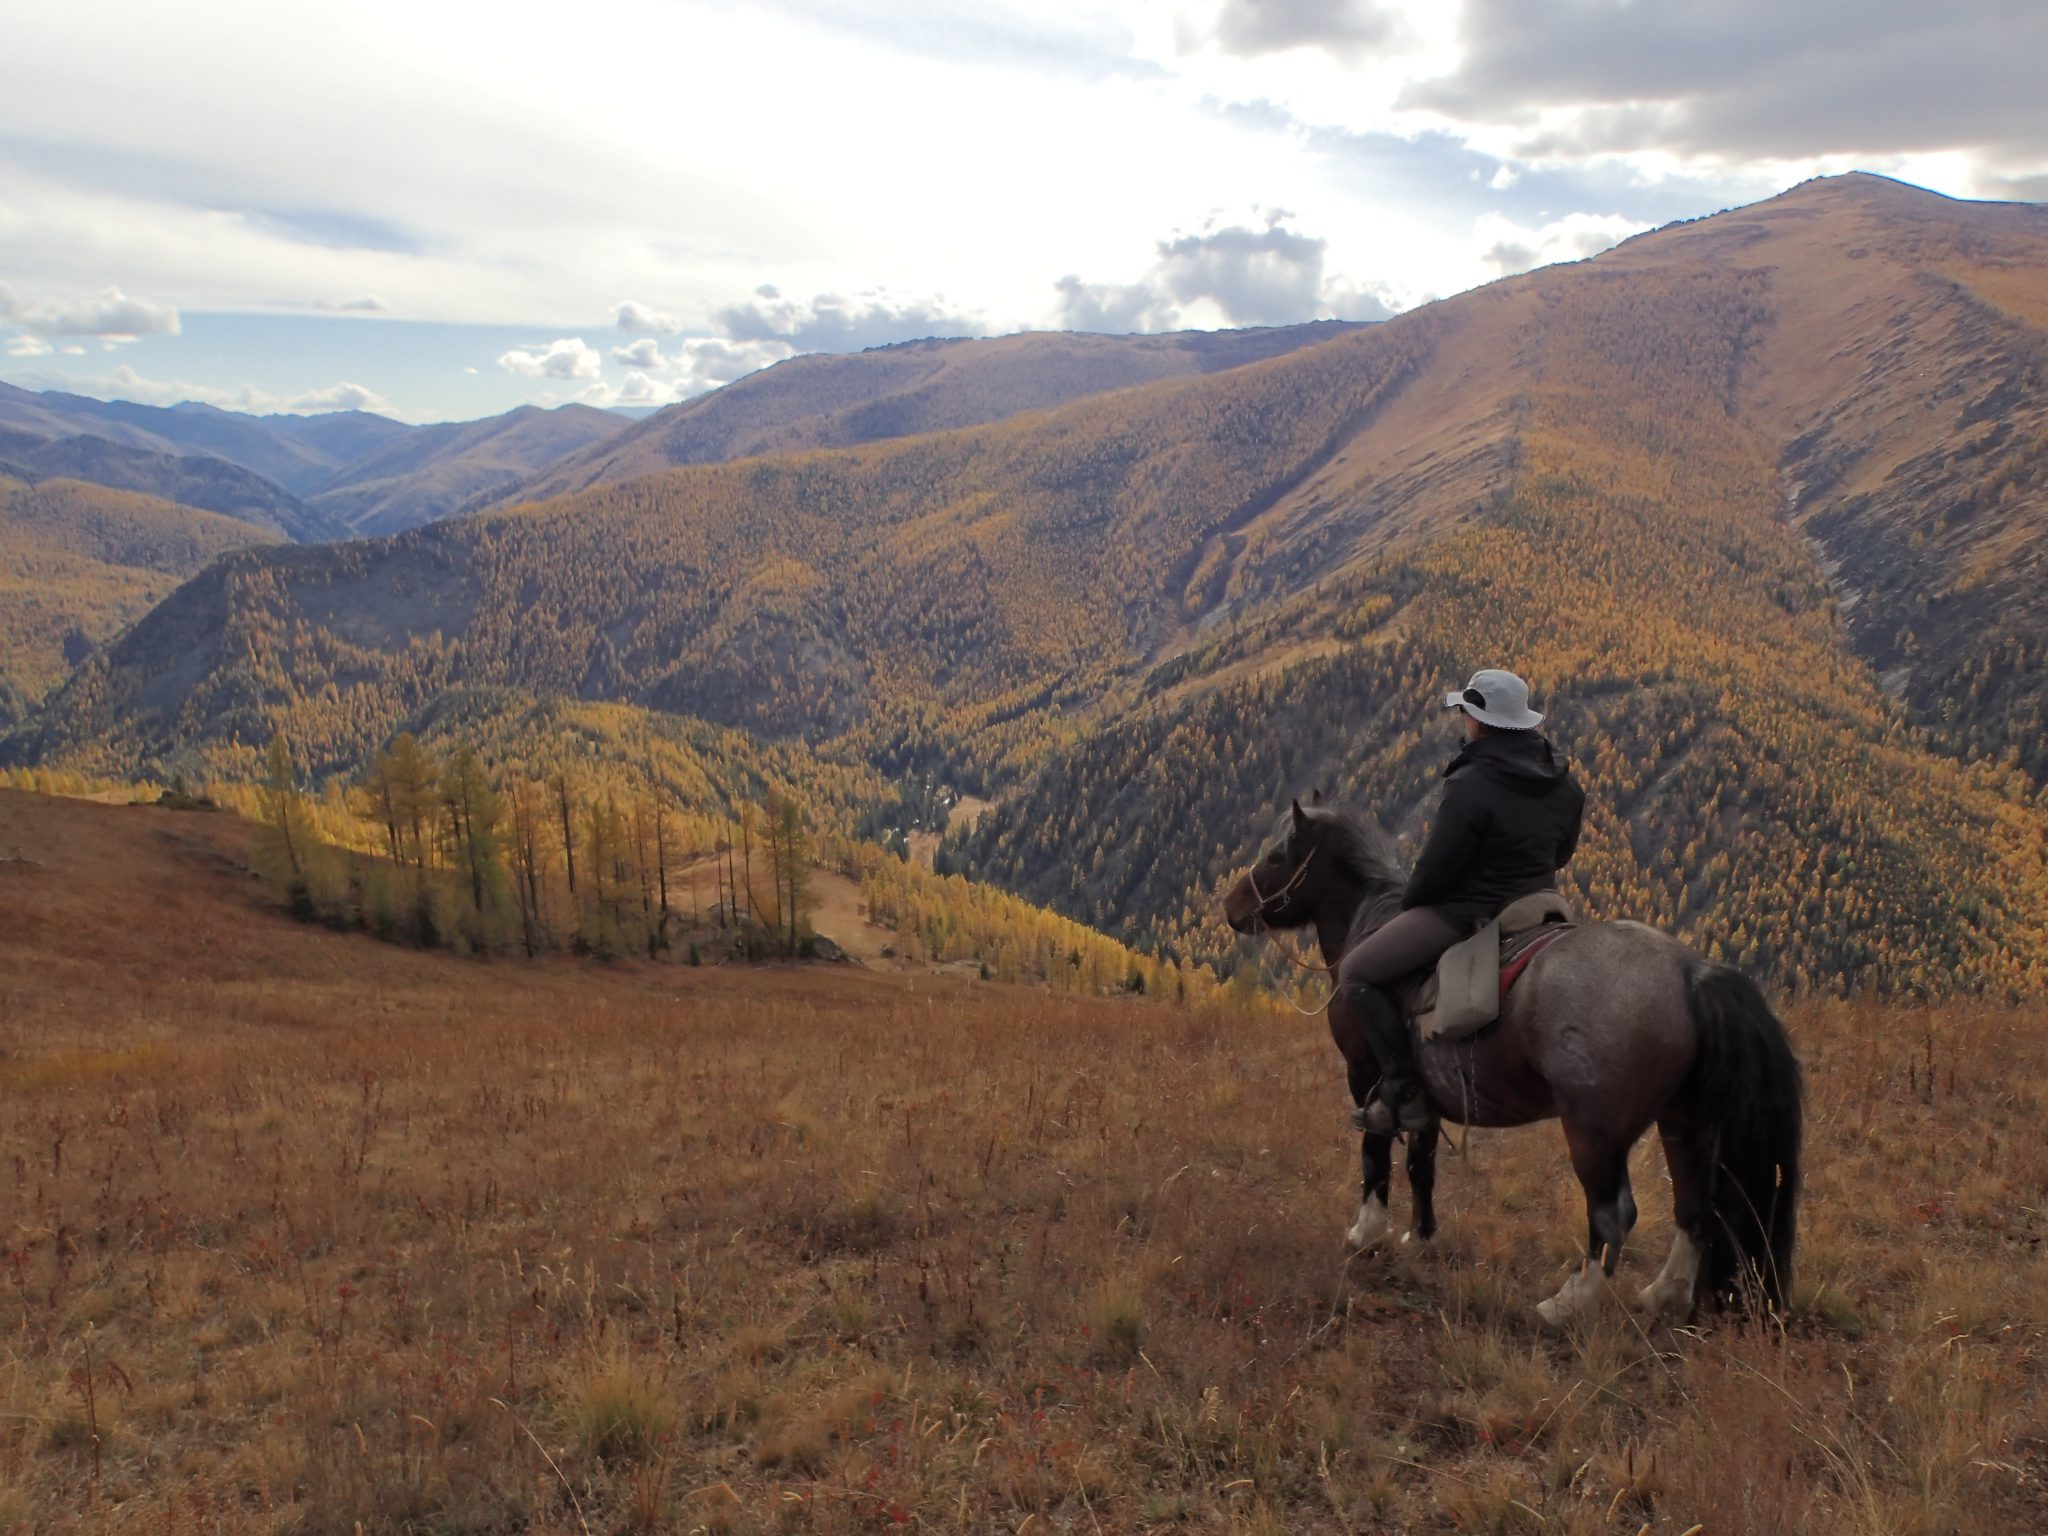 Paard in de bergen Mongolië